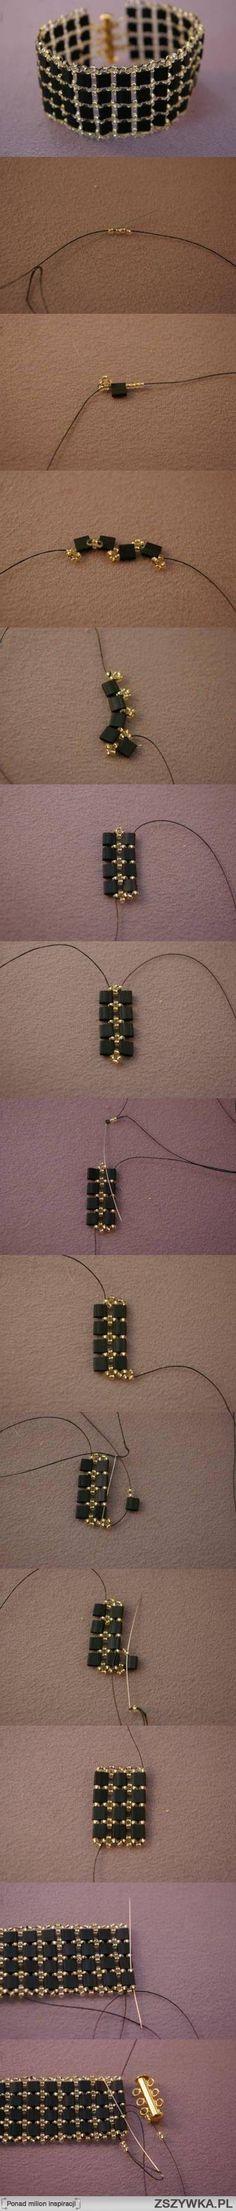 diy, diy projects, diy craft, handmade, diy beadwork bracelet